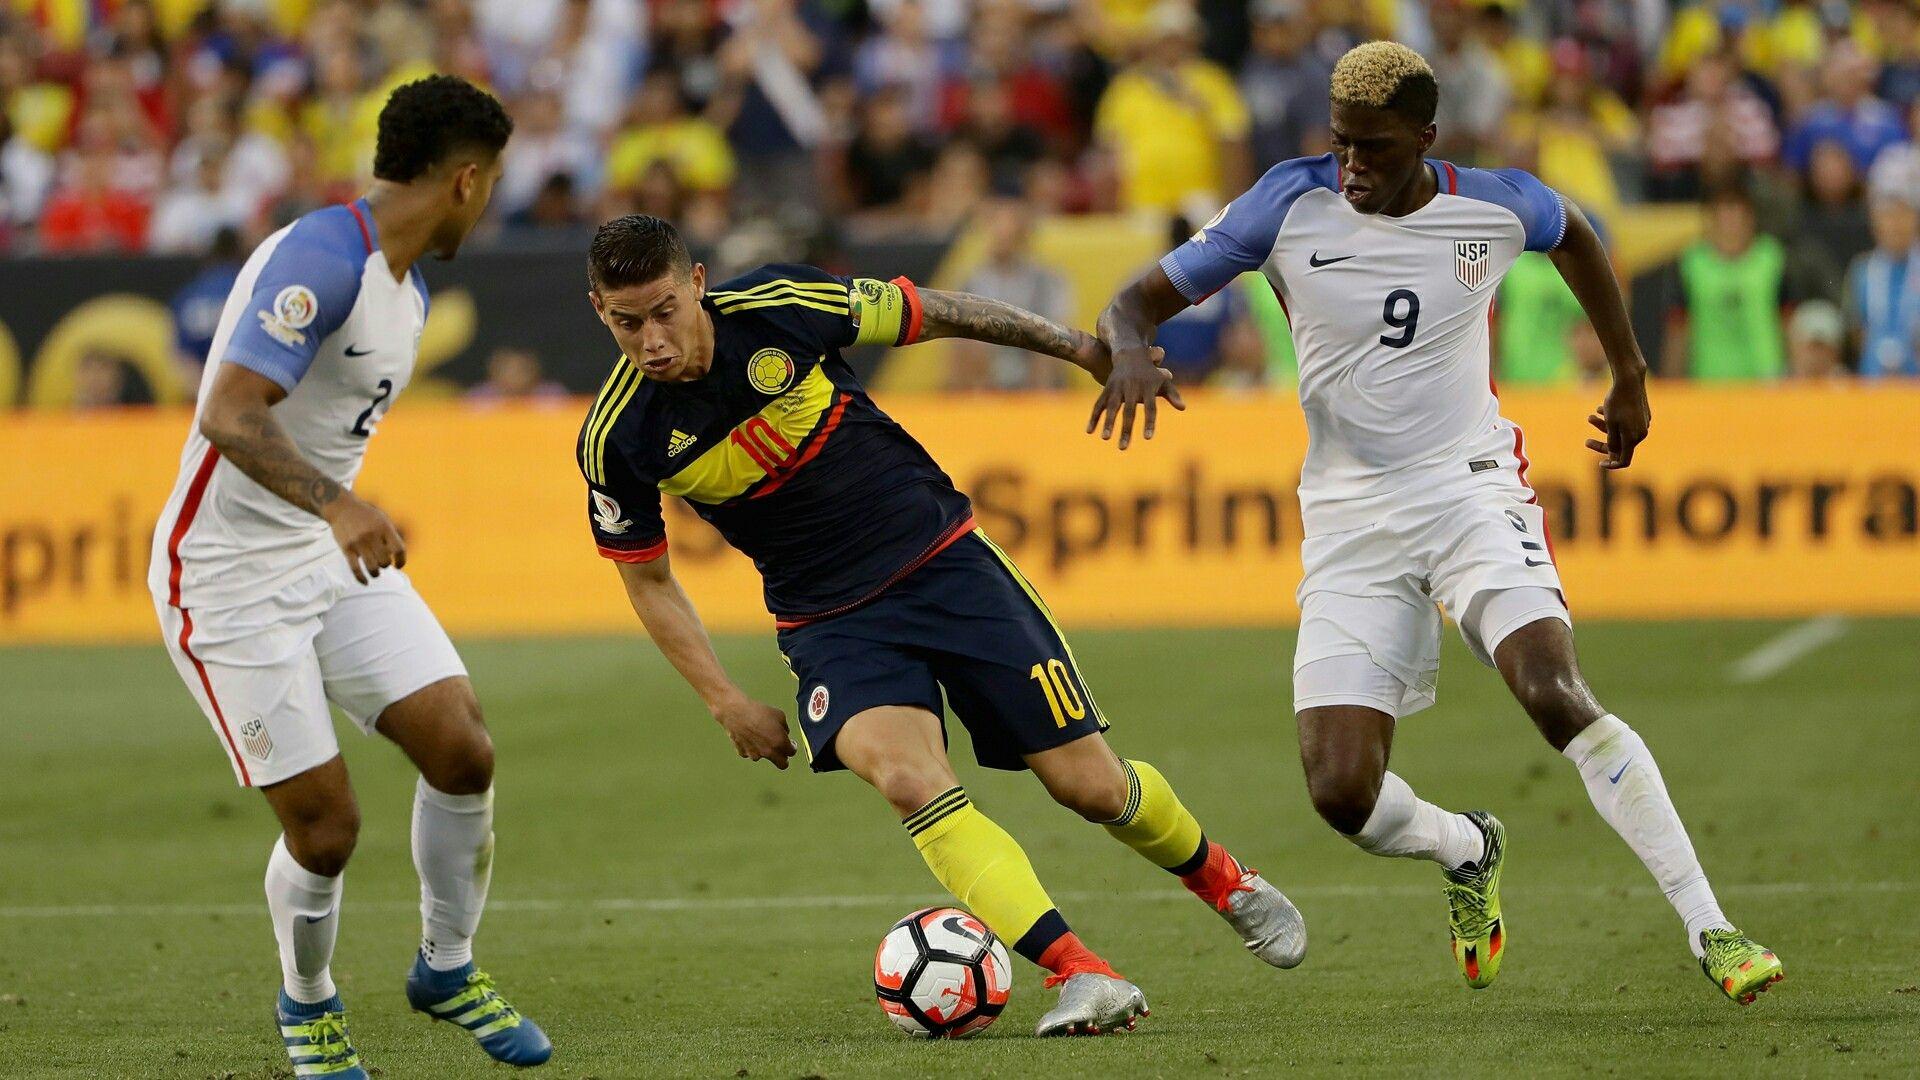 USA 0 Colombia 2 in 2016 in Santa Clara. James Rodriguez